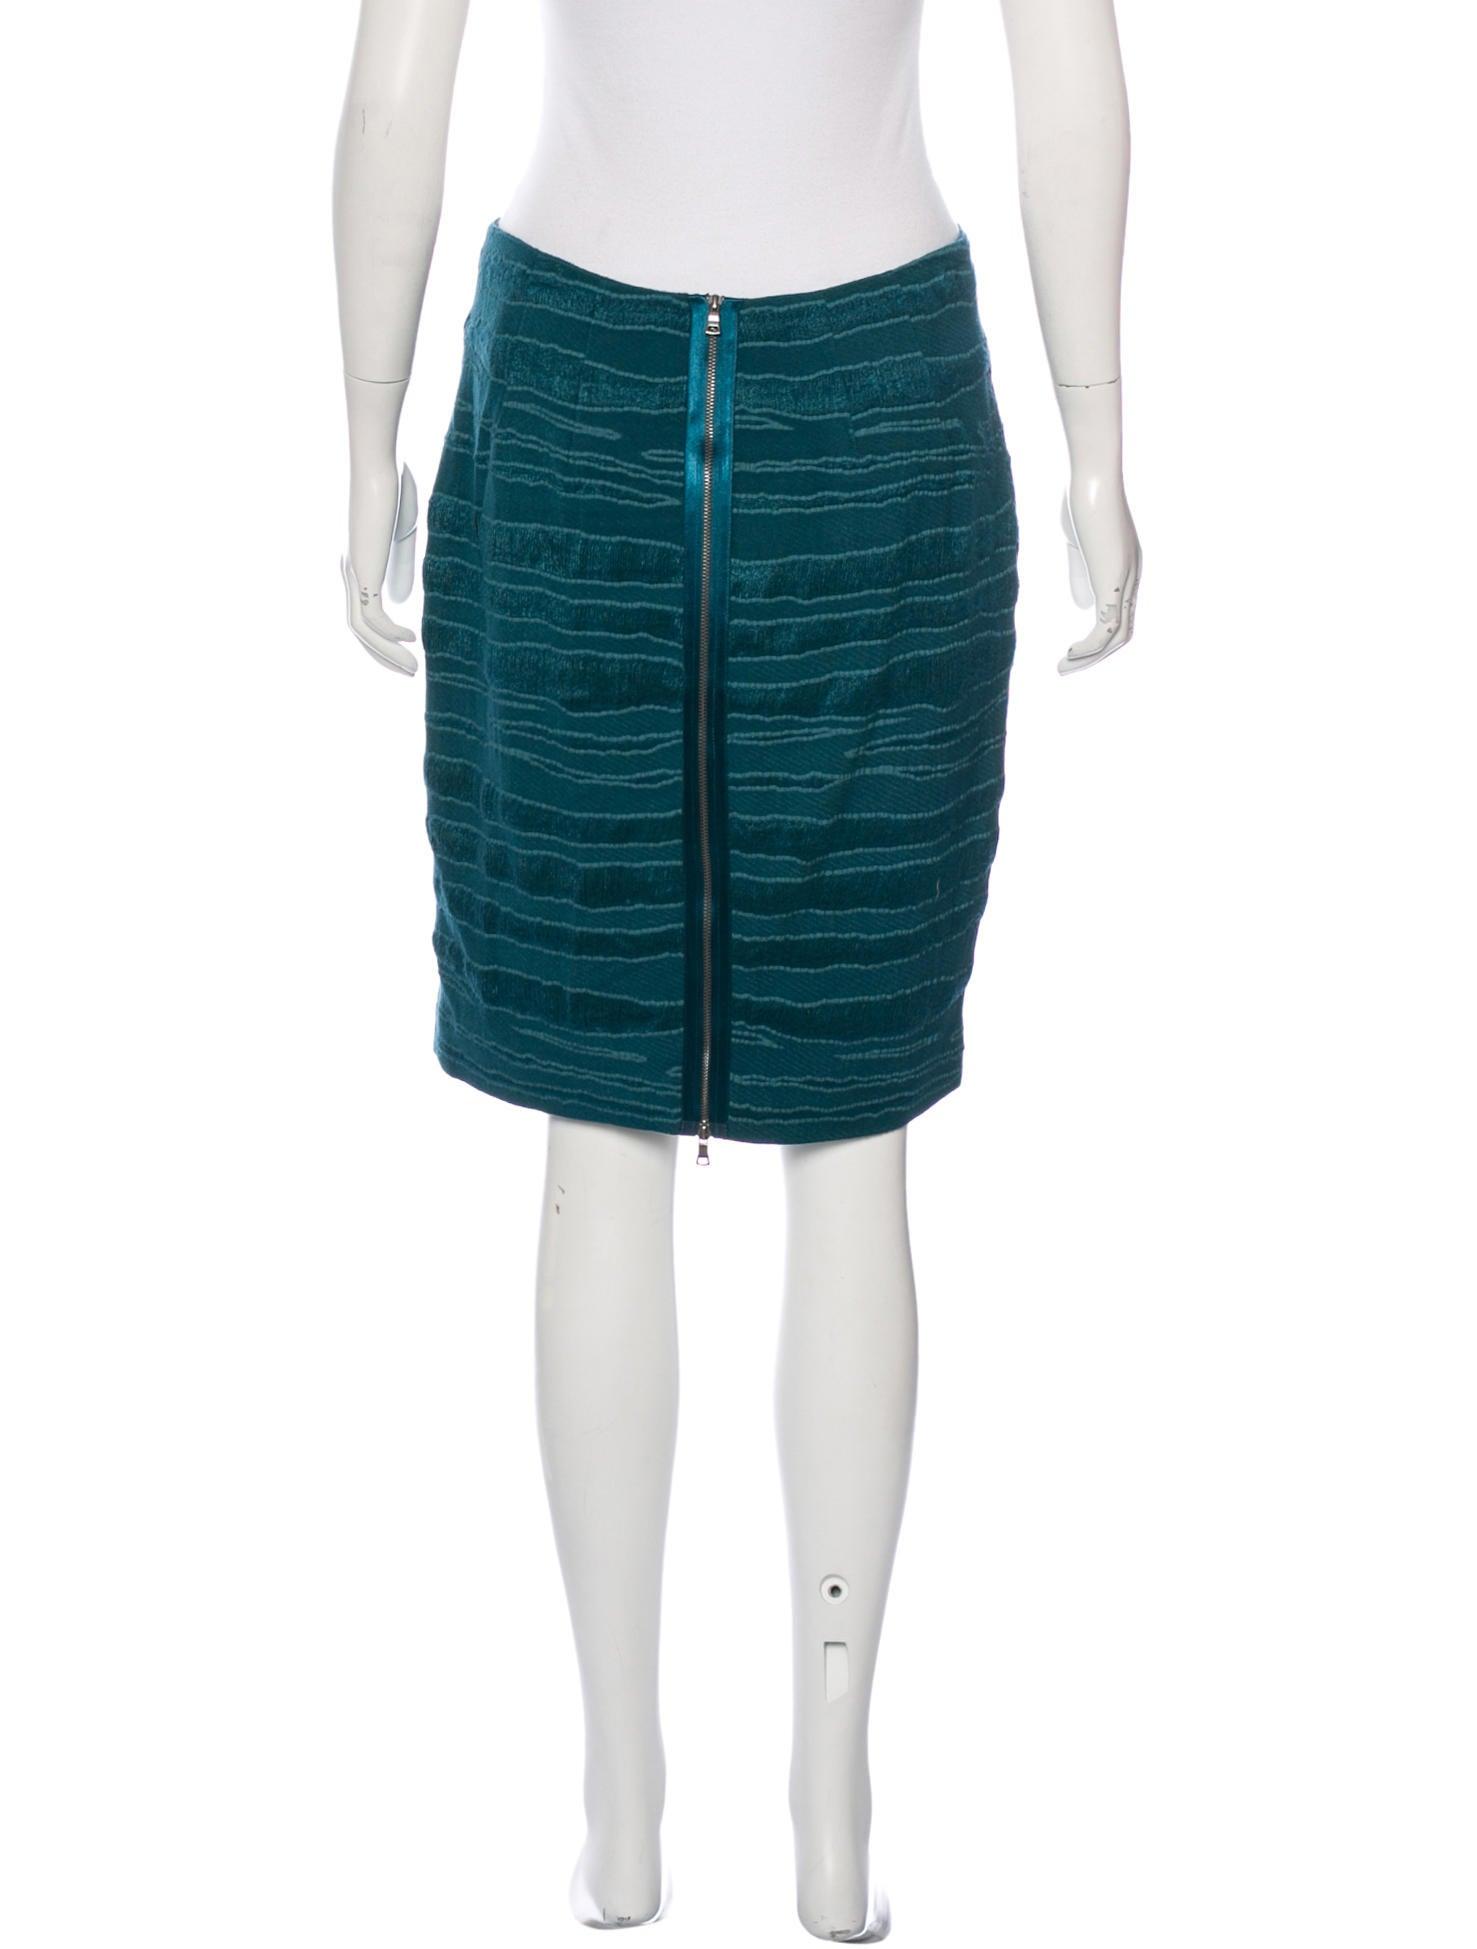 Jenni Kayne Knee-Length Pencil Skirt - Clothing